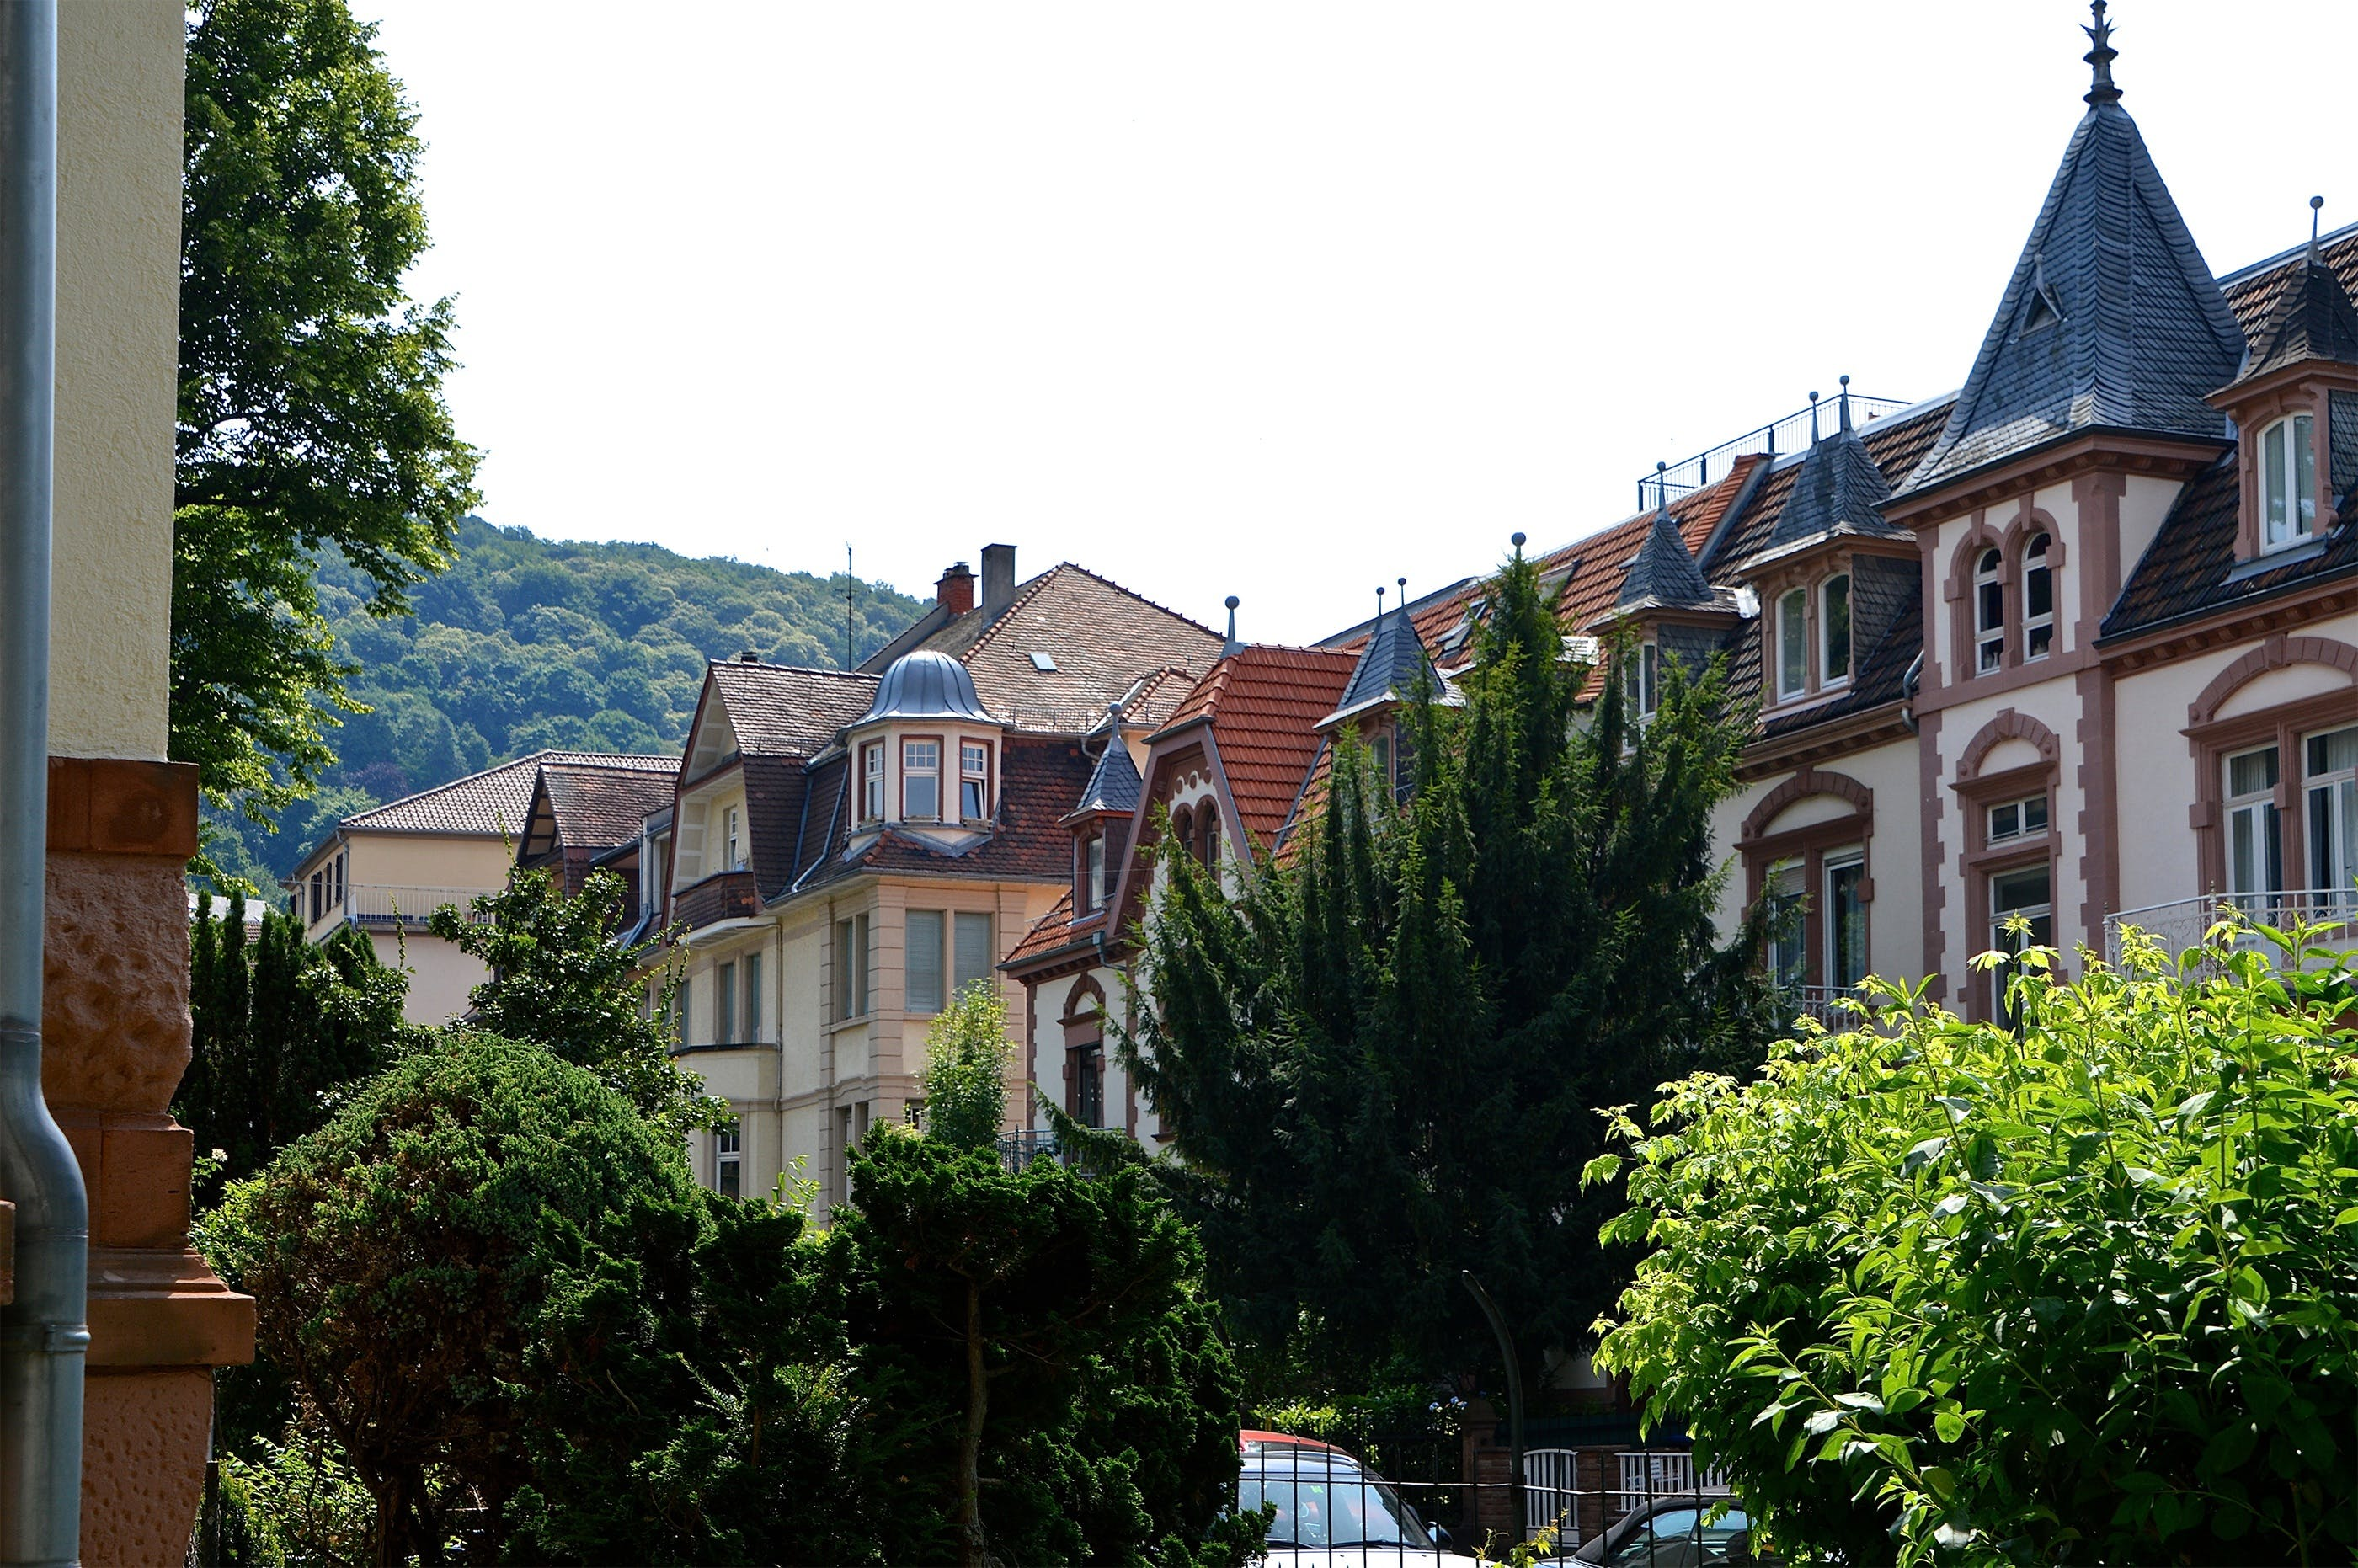 Panoramic Photo of Houses